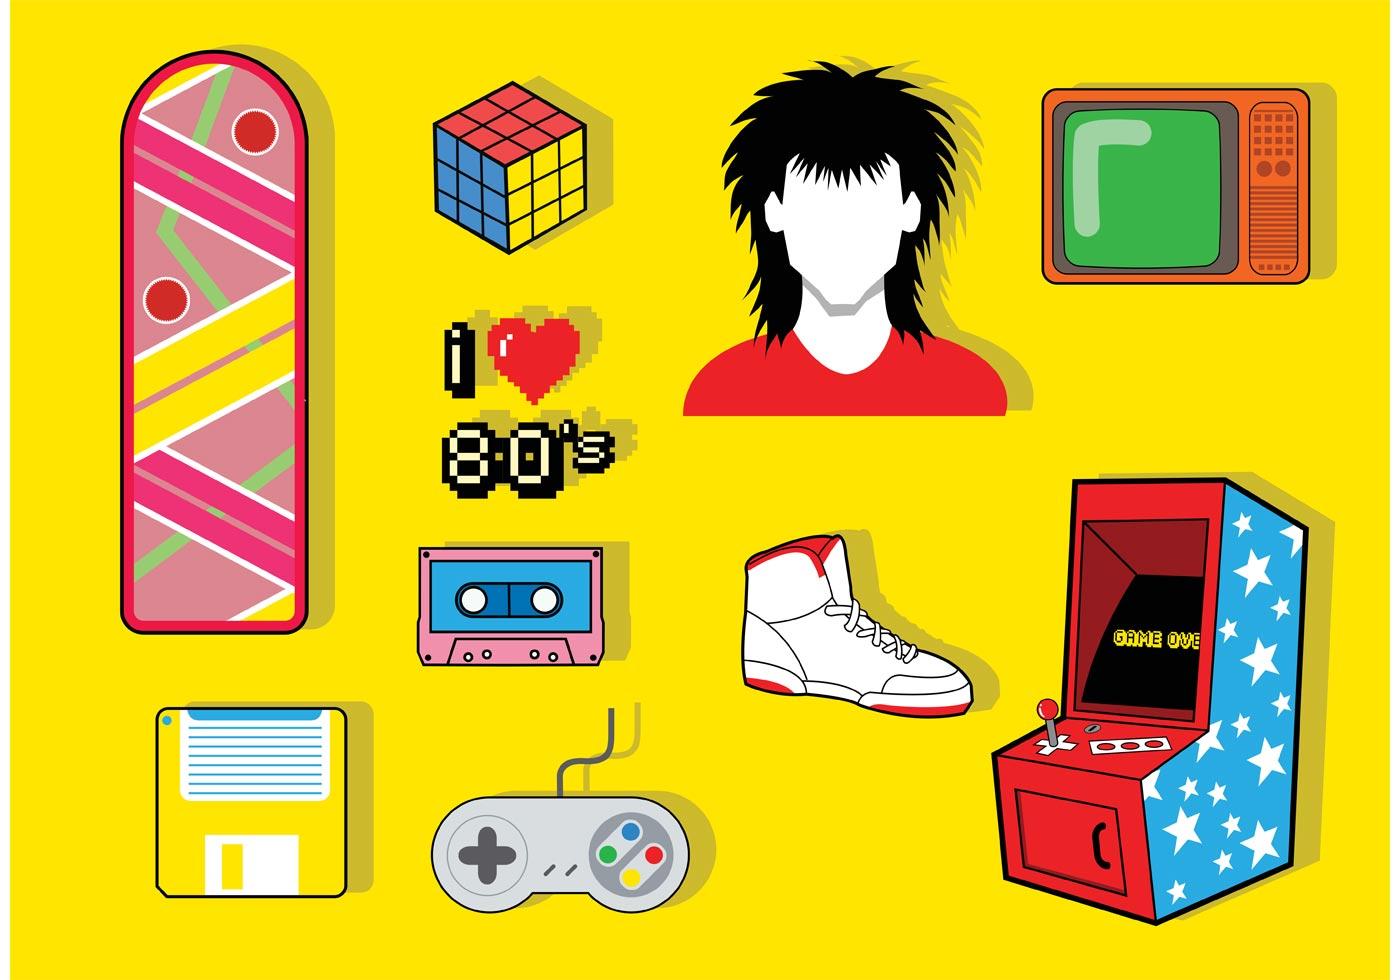 80siconvectorpack.jpg (1400×980) 80s posters, 80s